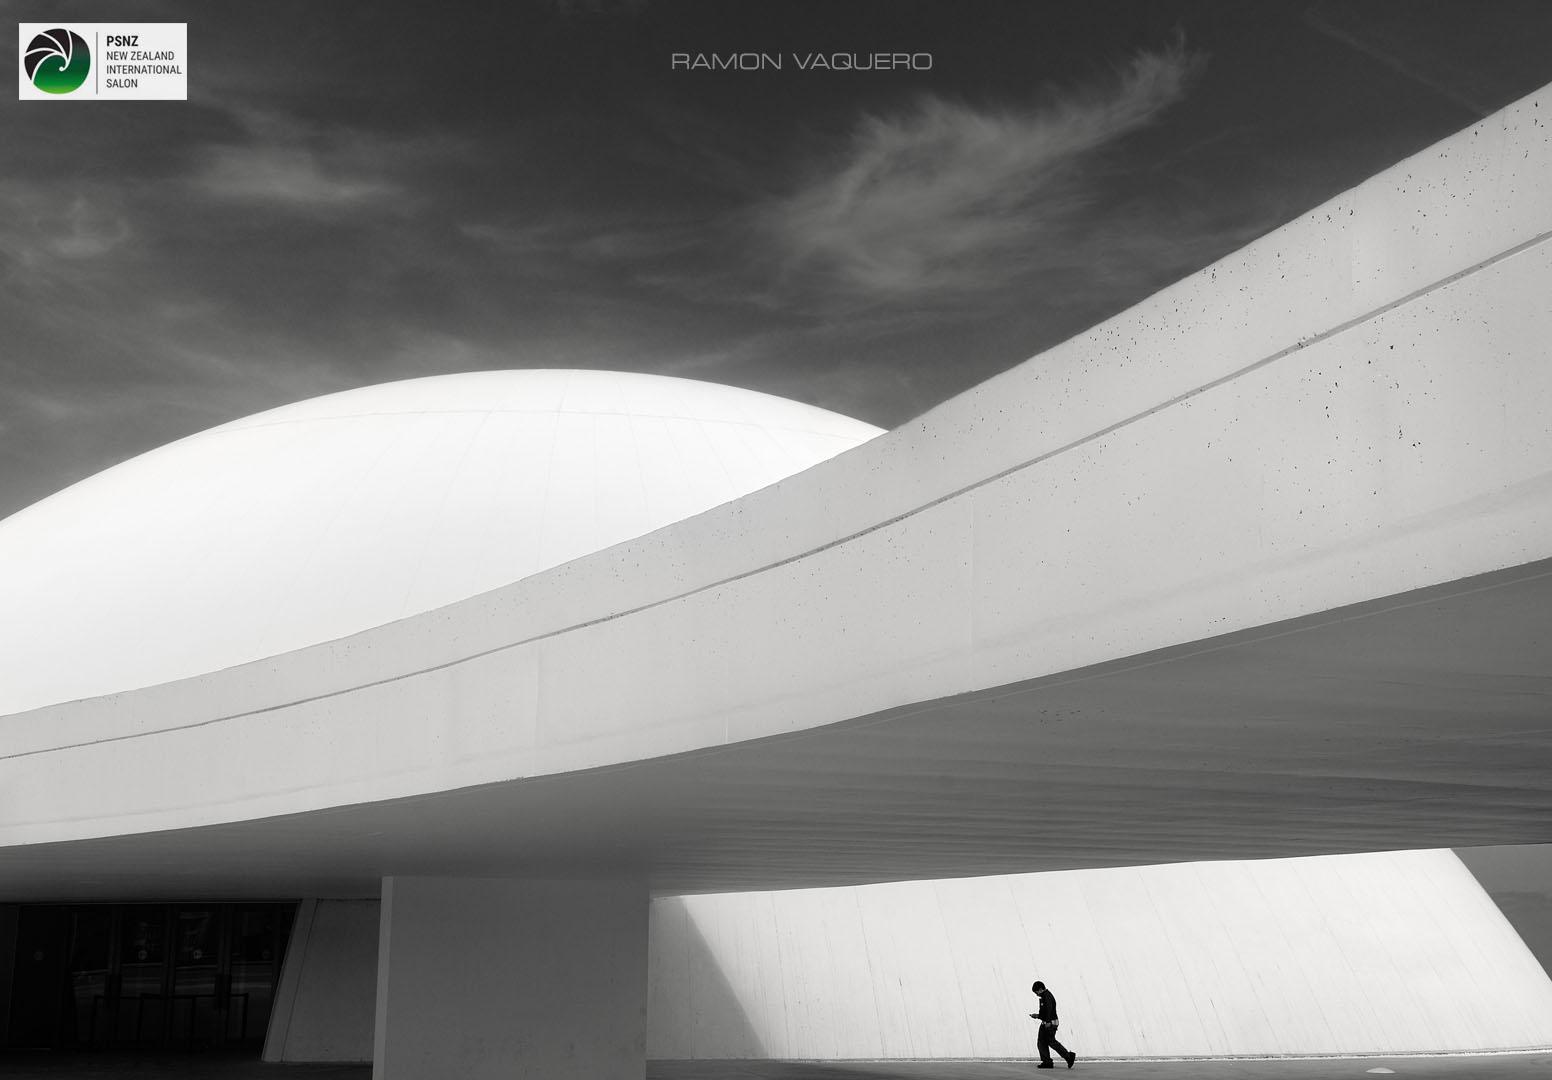 ramonvaquero_new-zealand-international-salon_Niemeyer-Center